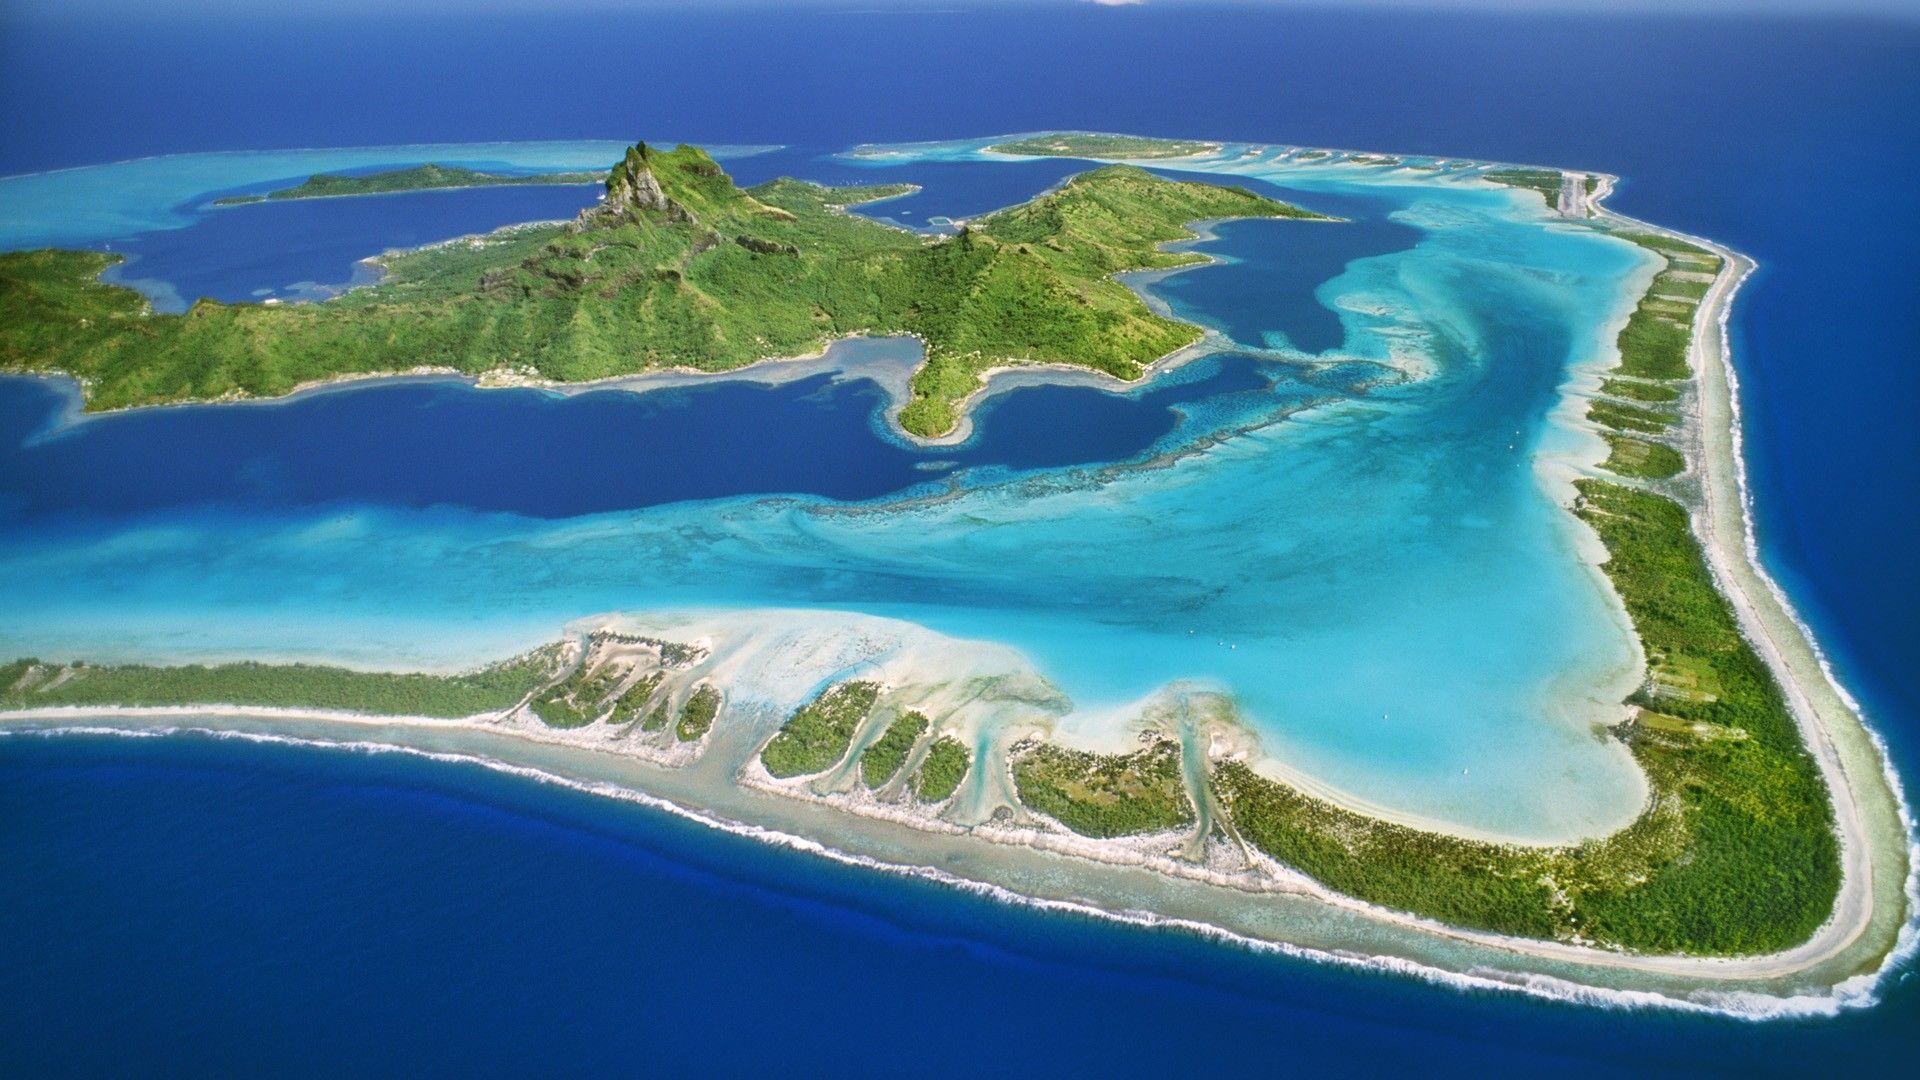 Bora Bora 1080p wallpaper